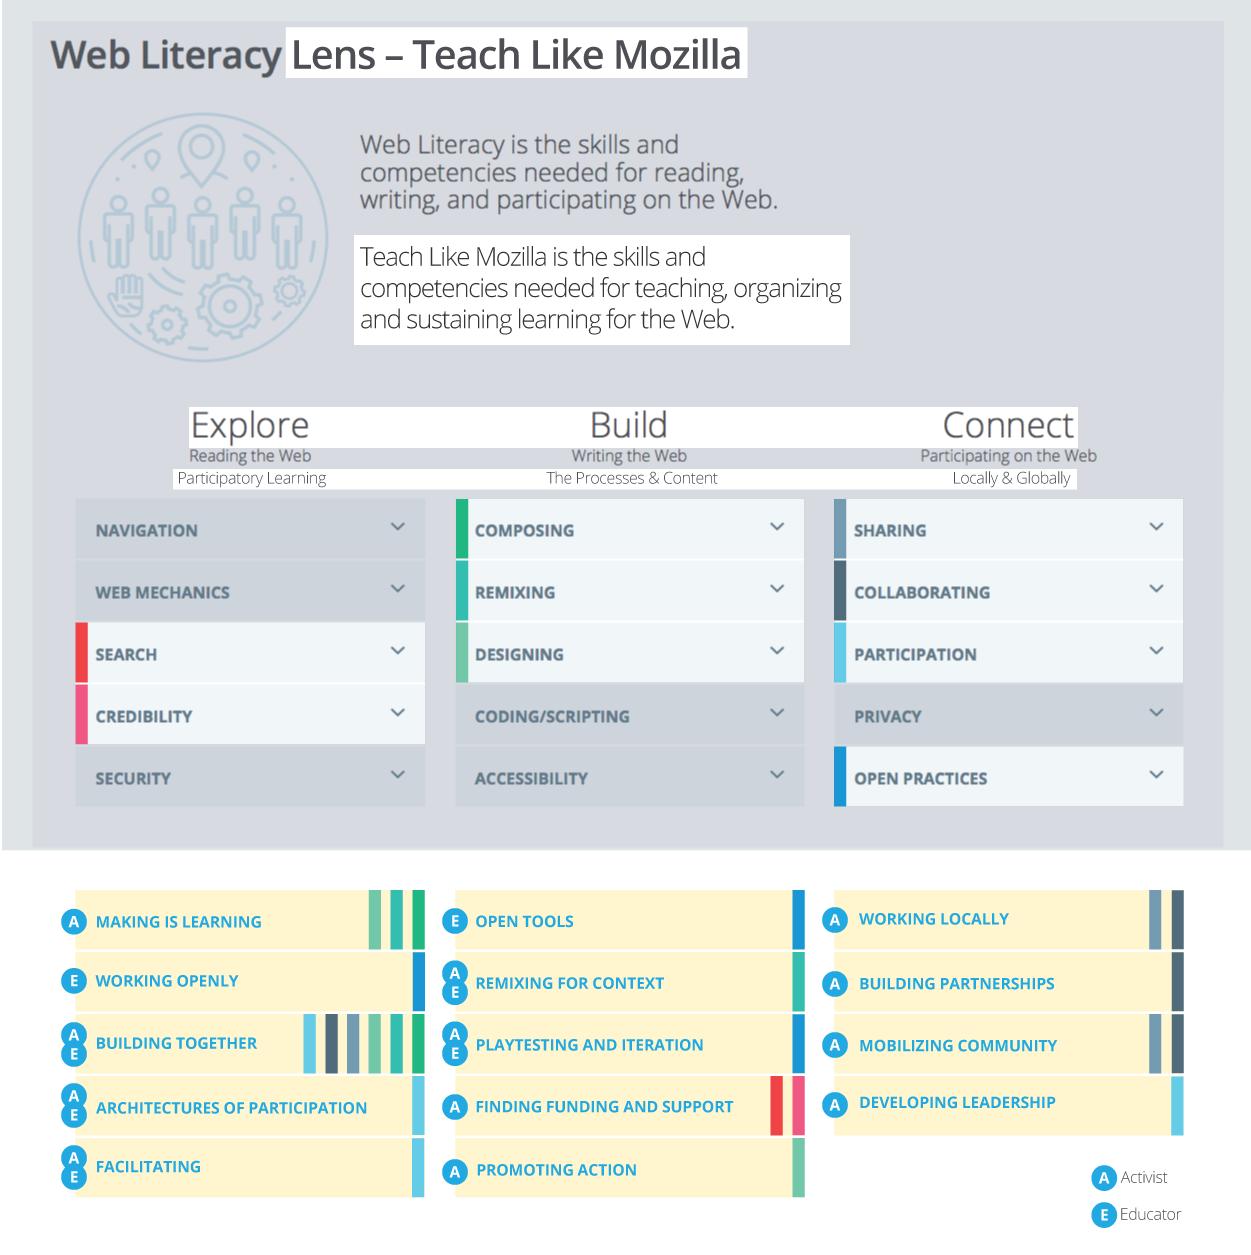 webliteracy-lens-TLM